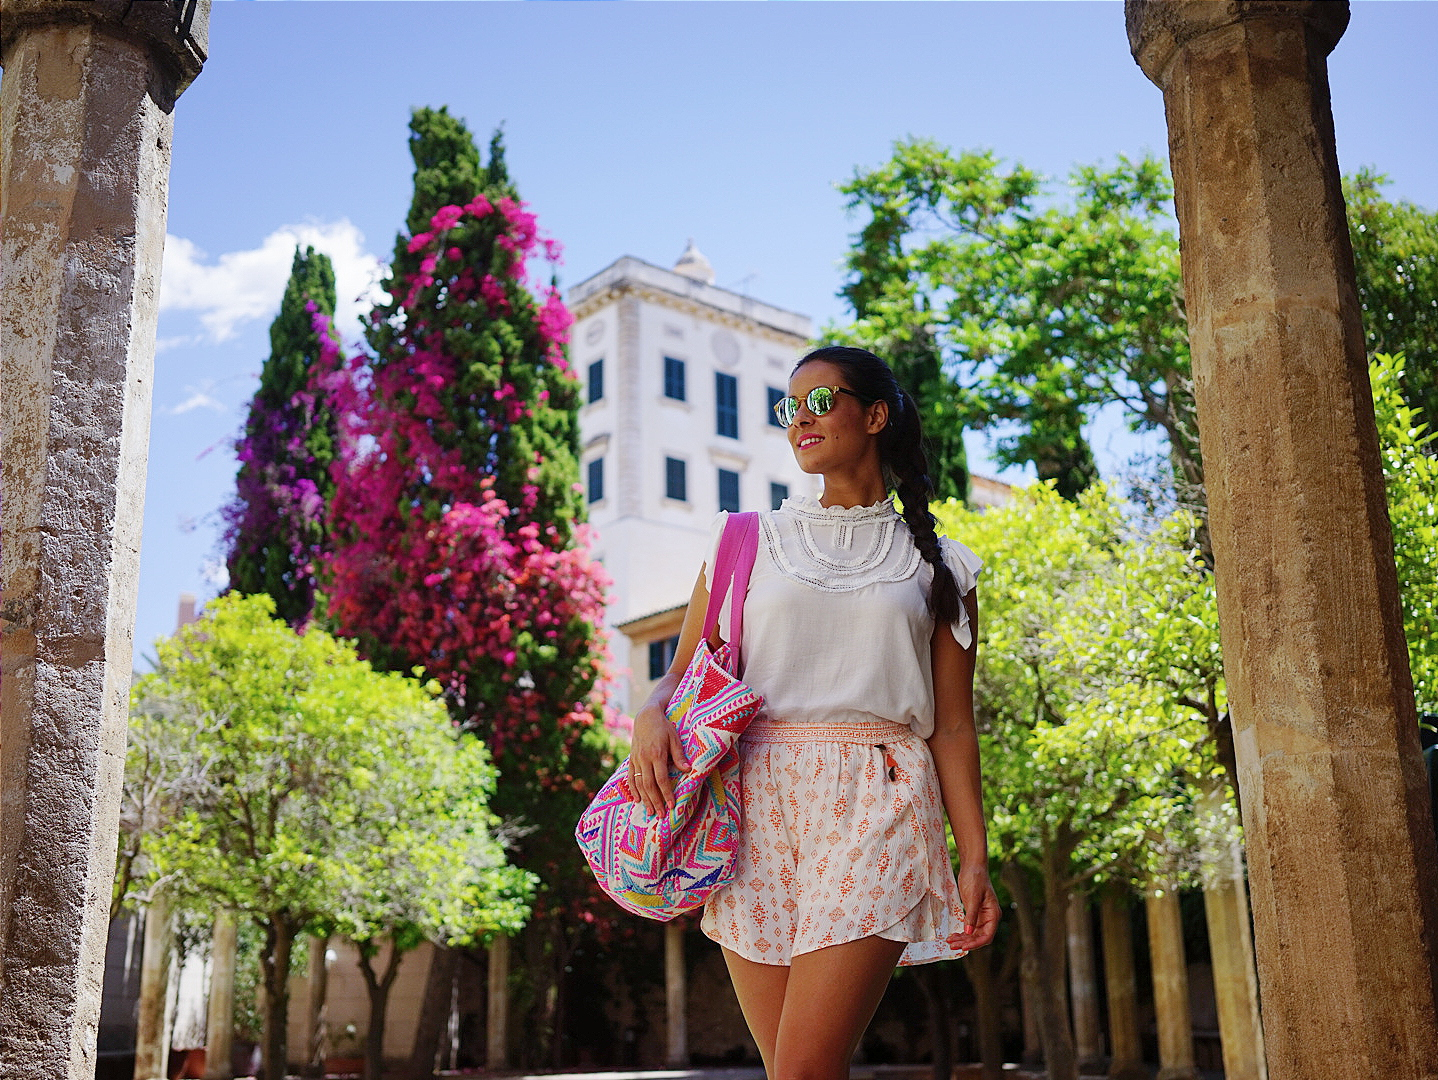 Instagram Crimenes de la Moda Maria Jesus Garnica Navarro @crimenesmoda